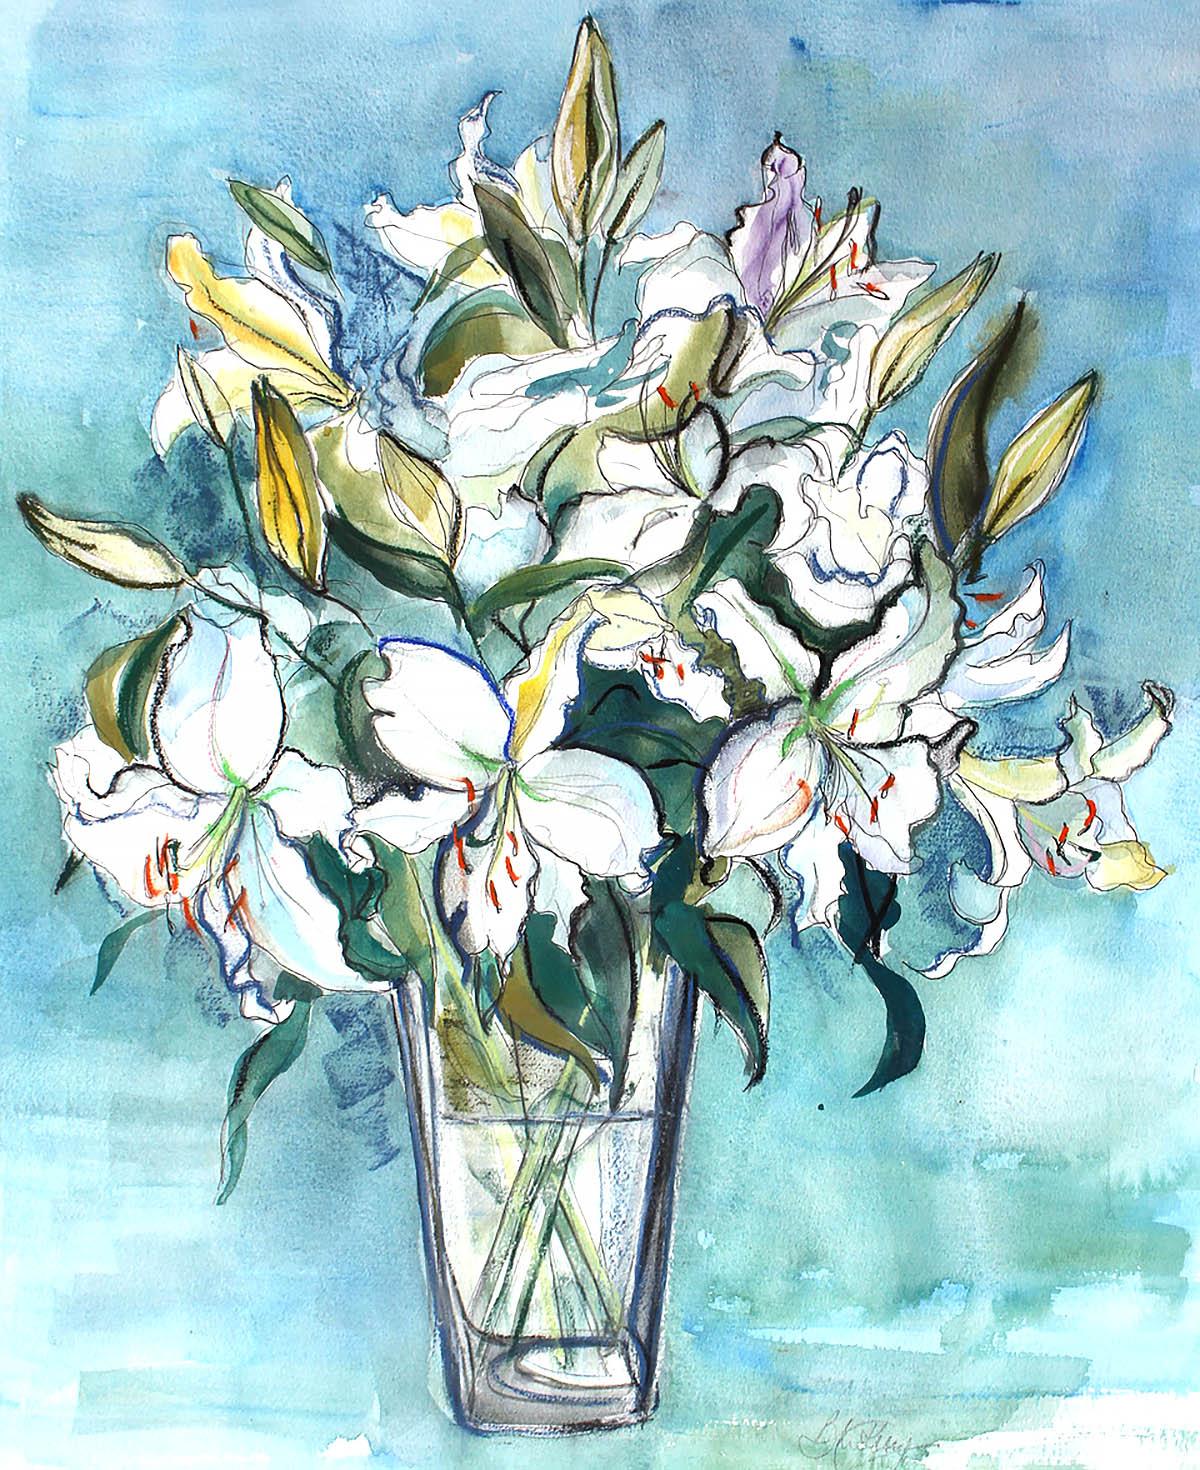 Barbara Kelly, 'Lillies', watercolours